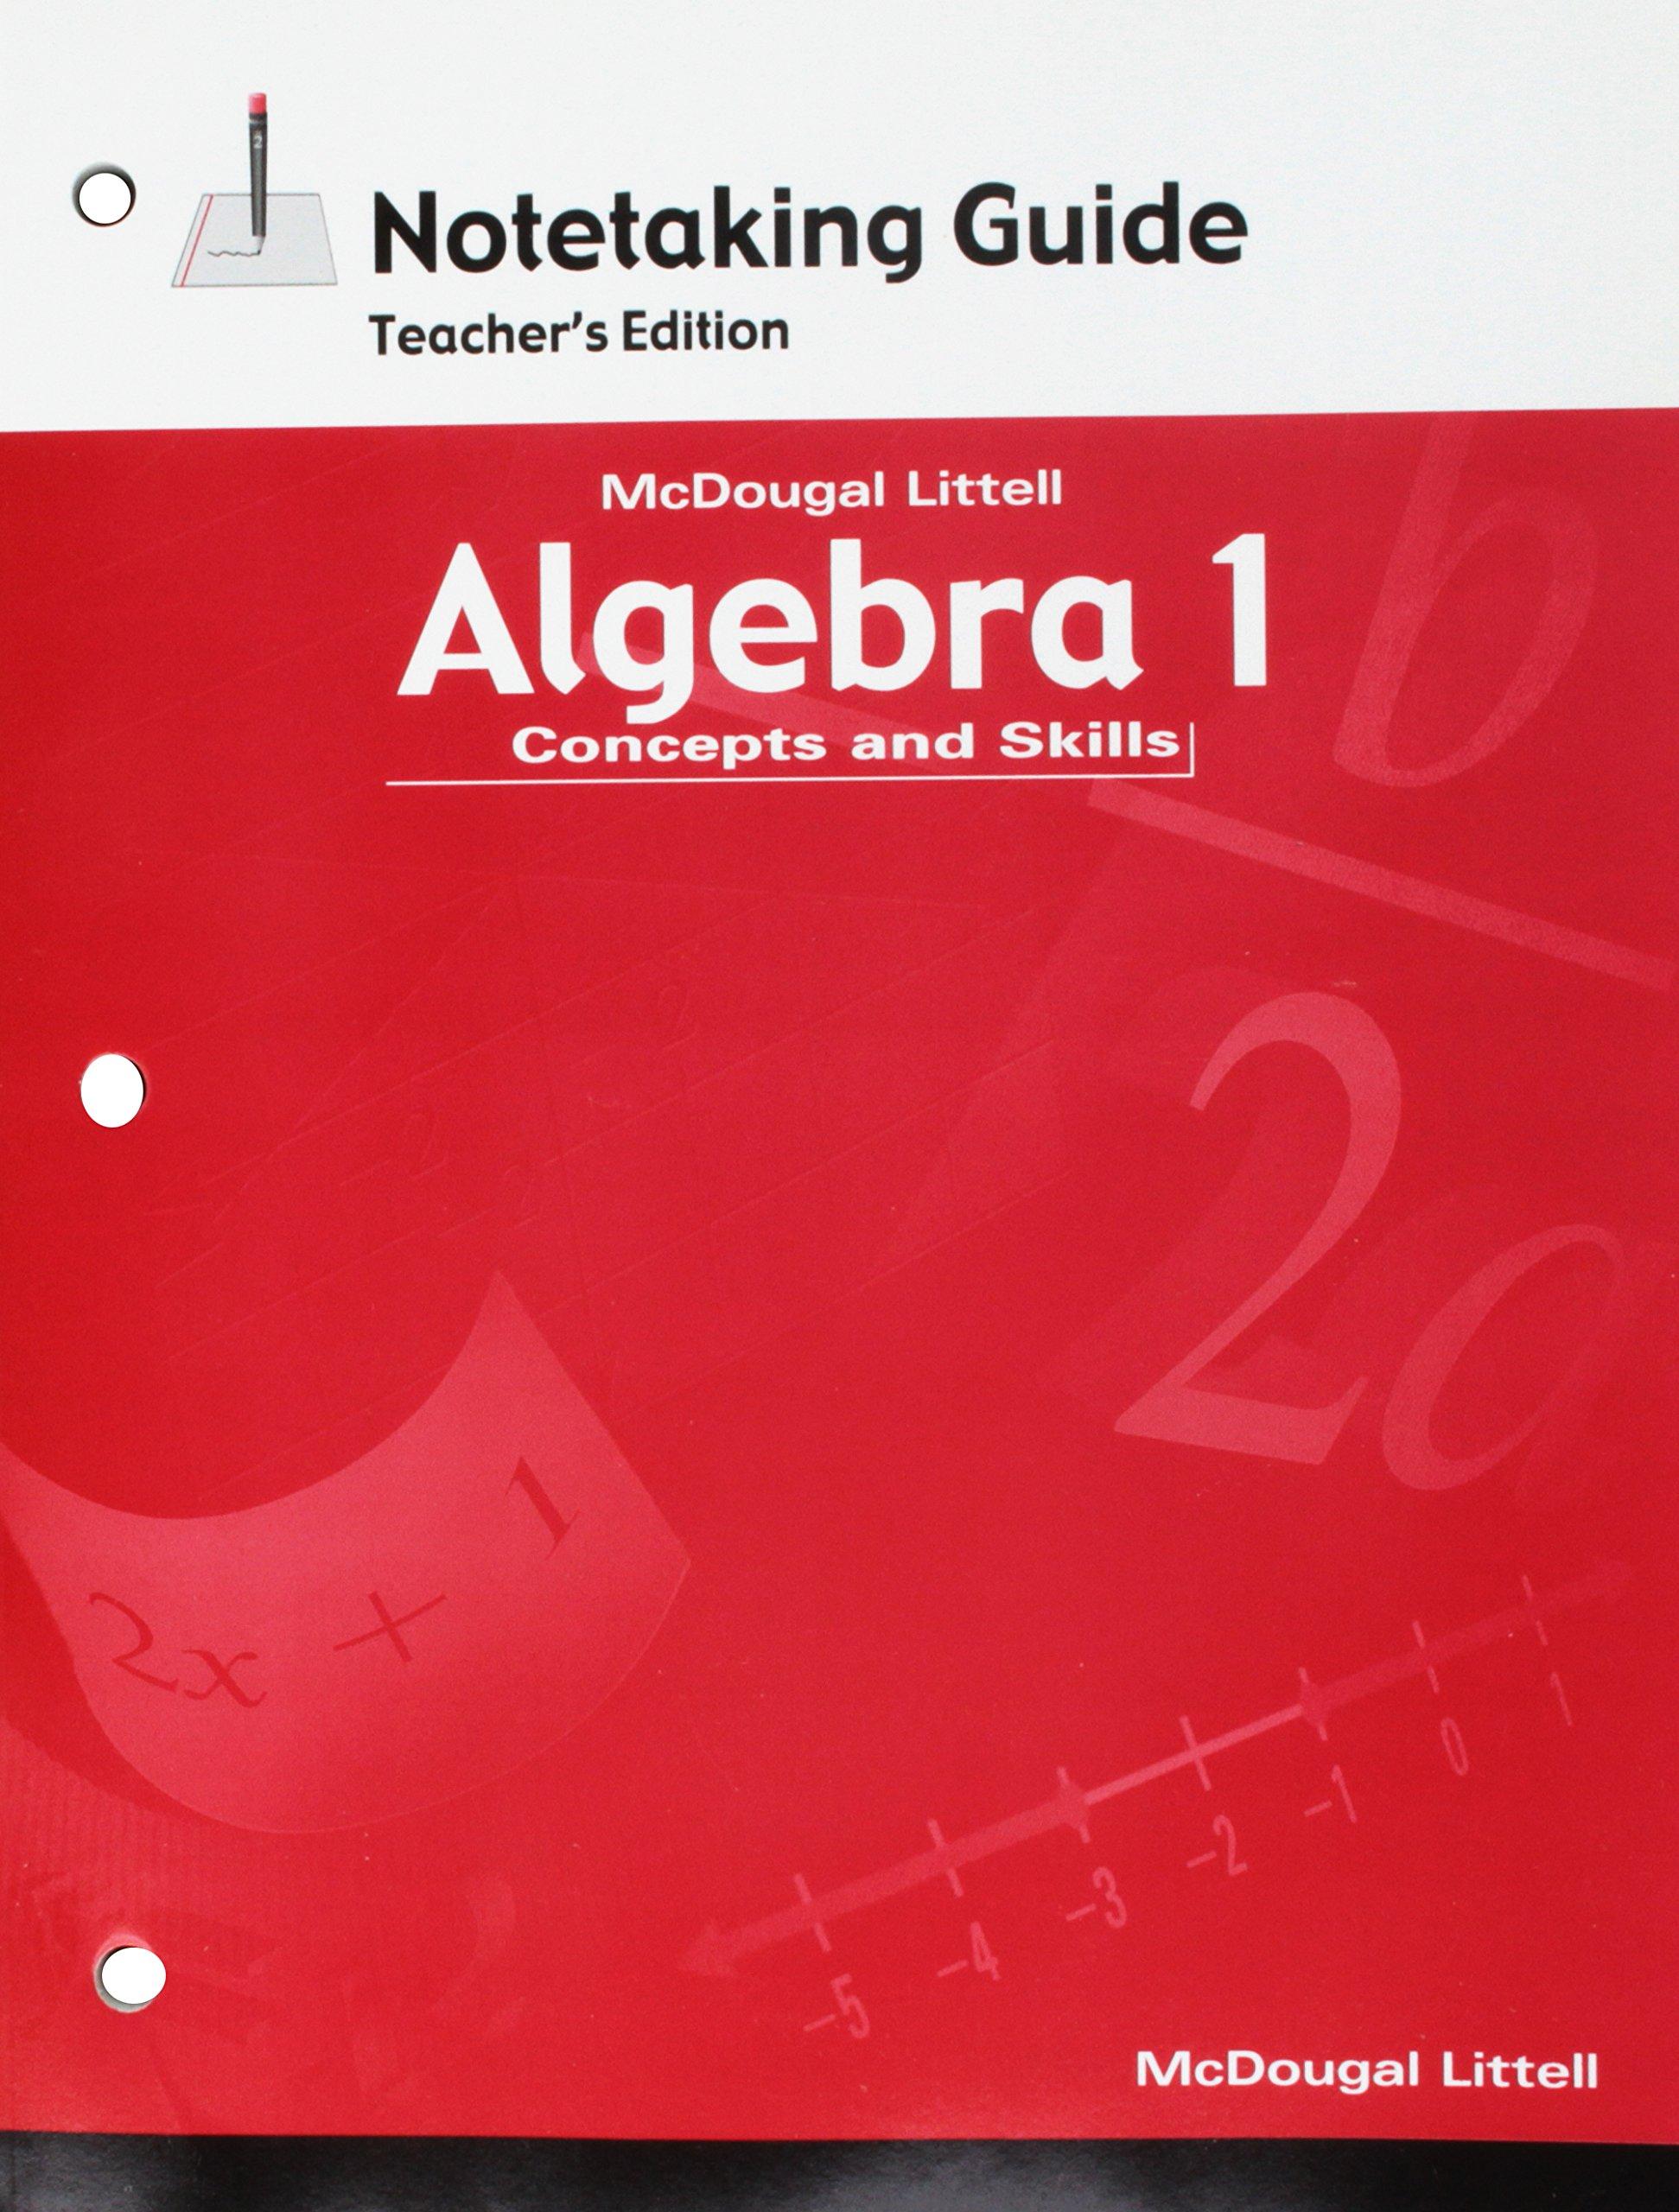 Amazon.com: Algebra 1: Concepts and Skills: Notetaking Guide Teacher  Edition (9780618410613): MCDOUGAL LITTEL: Books